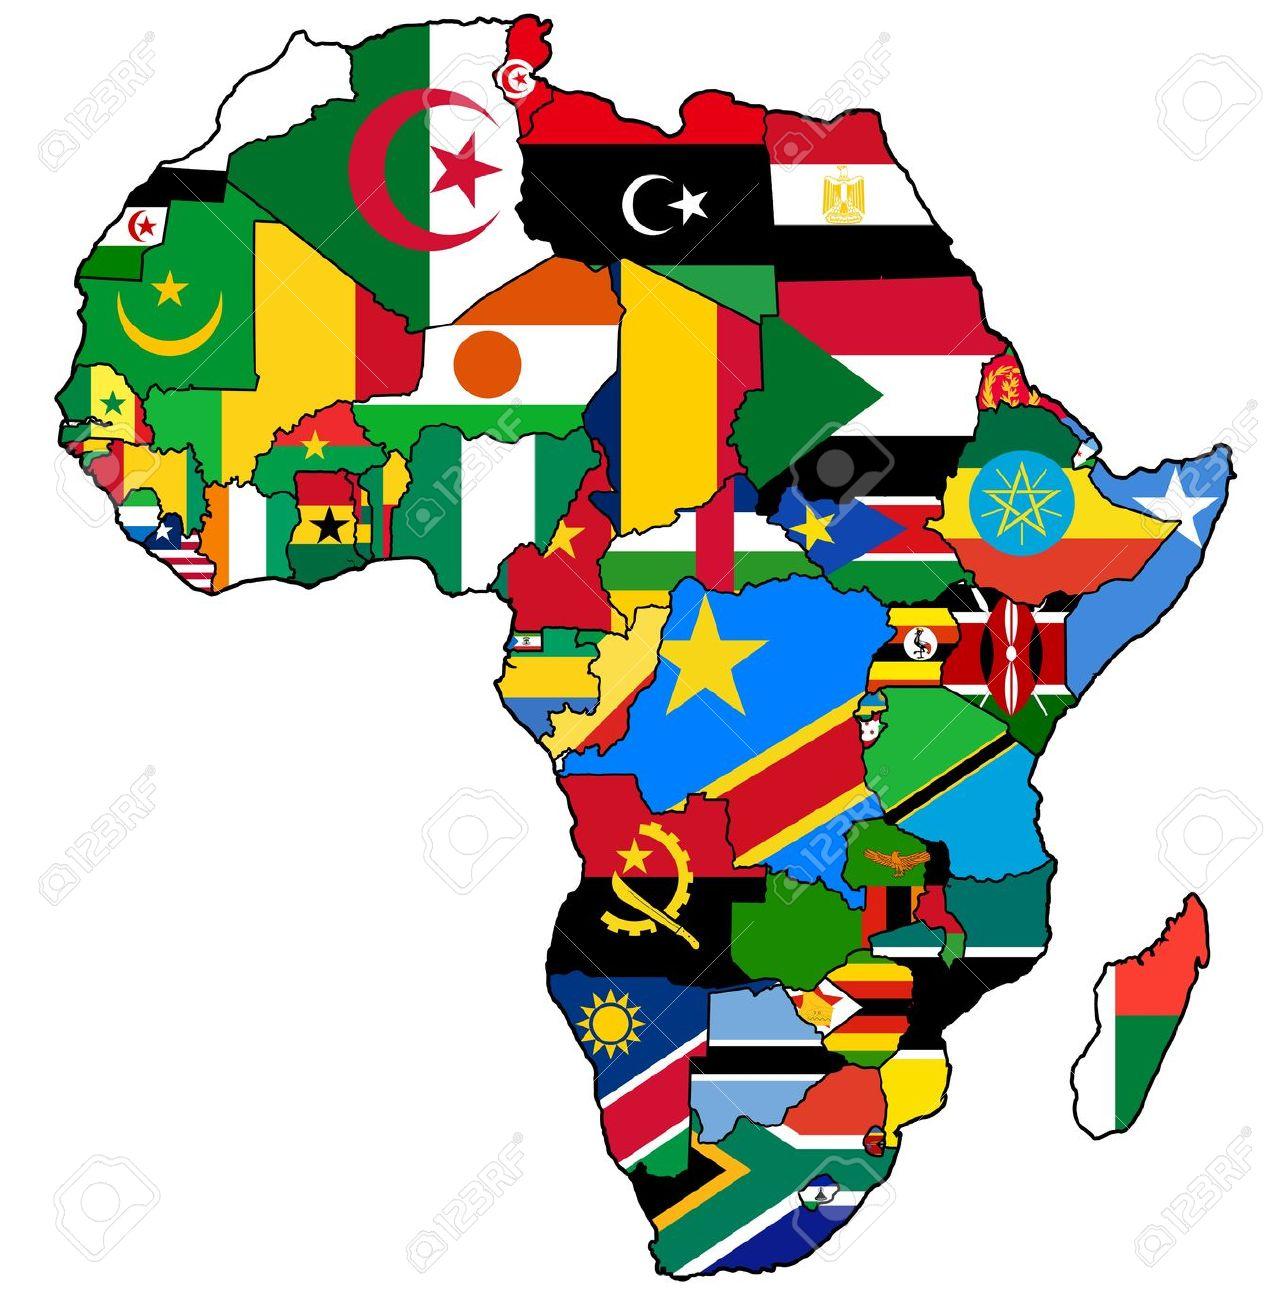 https://www.mays-mouissi.com/wp-content/uploads/2015/06/Afrique.jpg